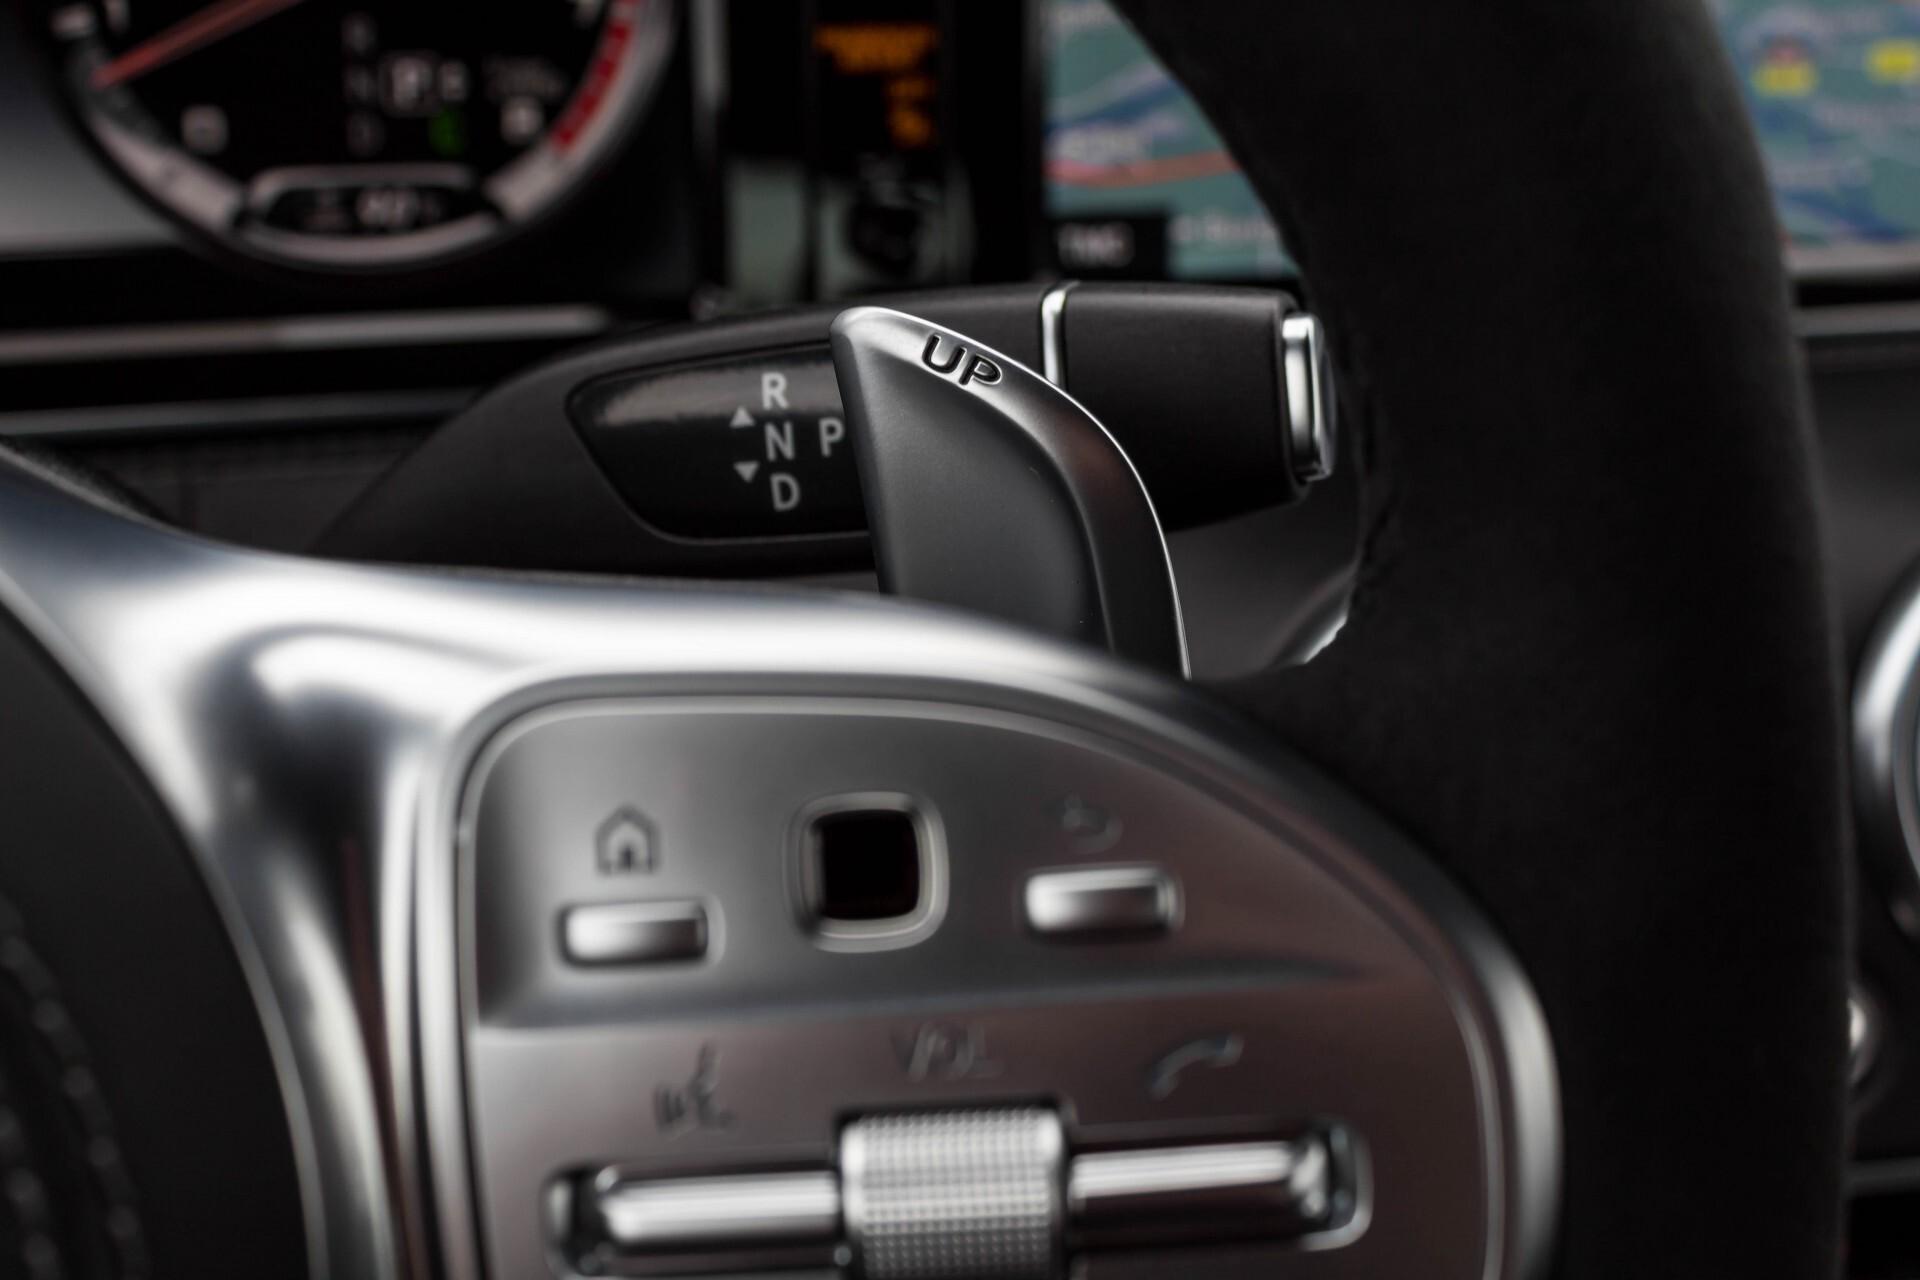 Mercedes-Benz S-Klasse Cabrio 63 AMG 4-M Ceramic/Designo/Carbon/Burmester High End Aut Foto 15